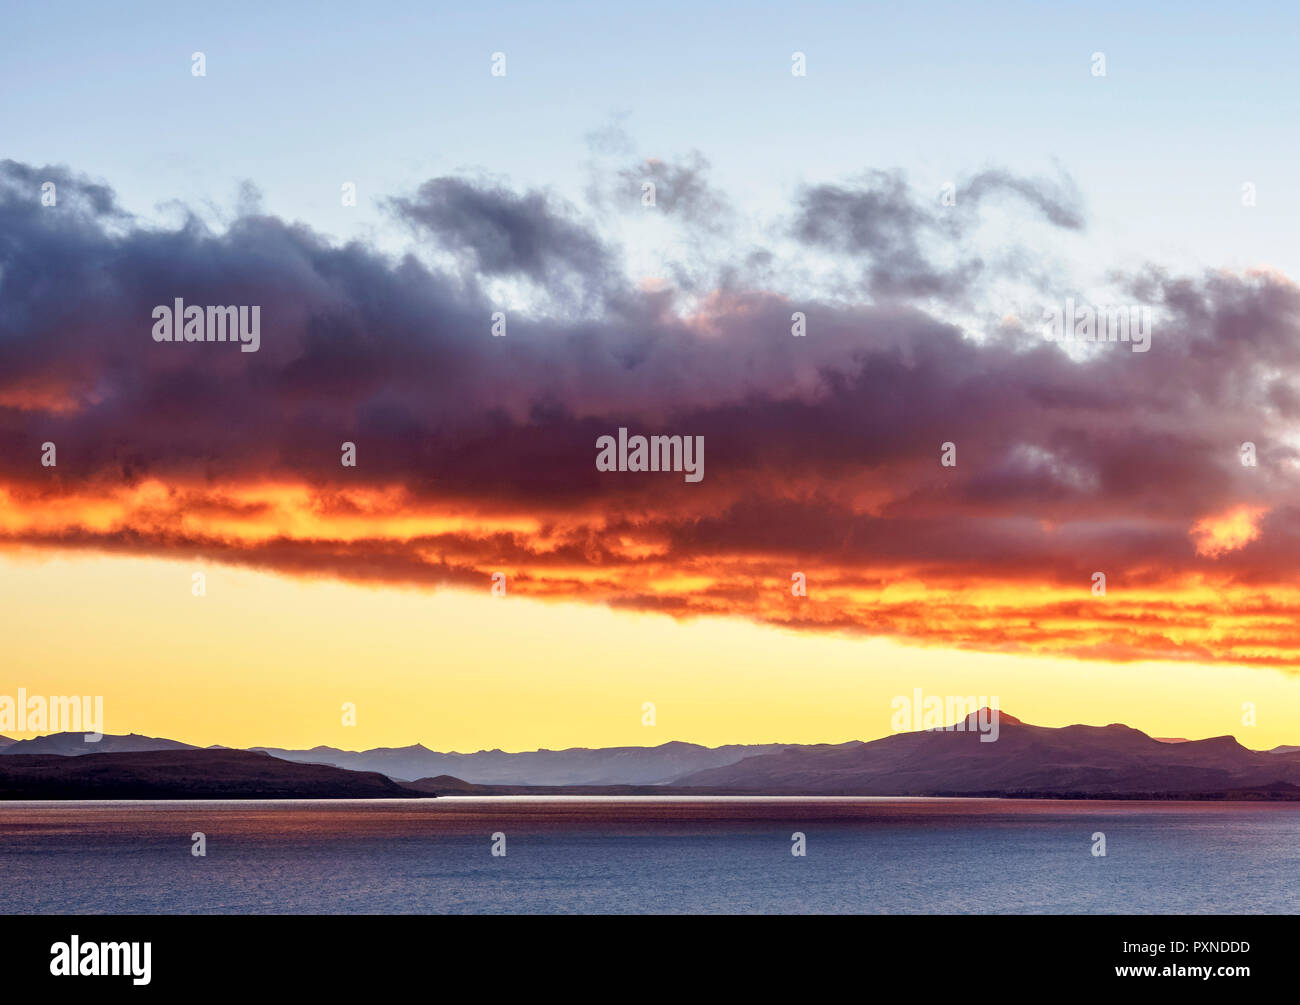 Nahuel Huapi Lake at sunrise, San Carlos de Bariloche, Nahuel Huapi National Park, Rio Negro Province, Argentina - Stock Image